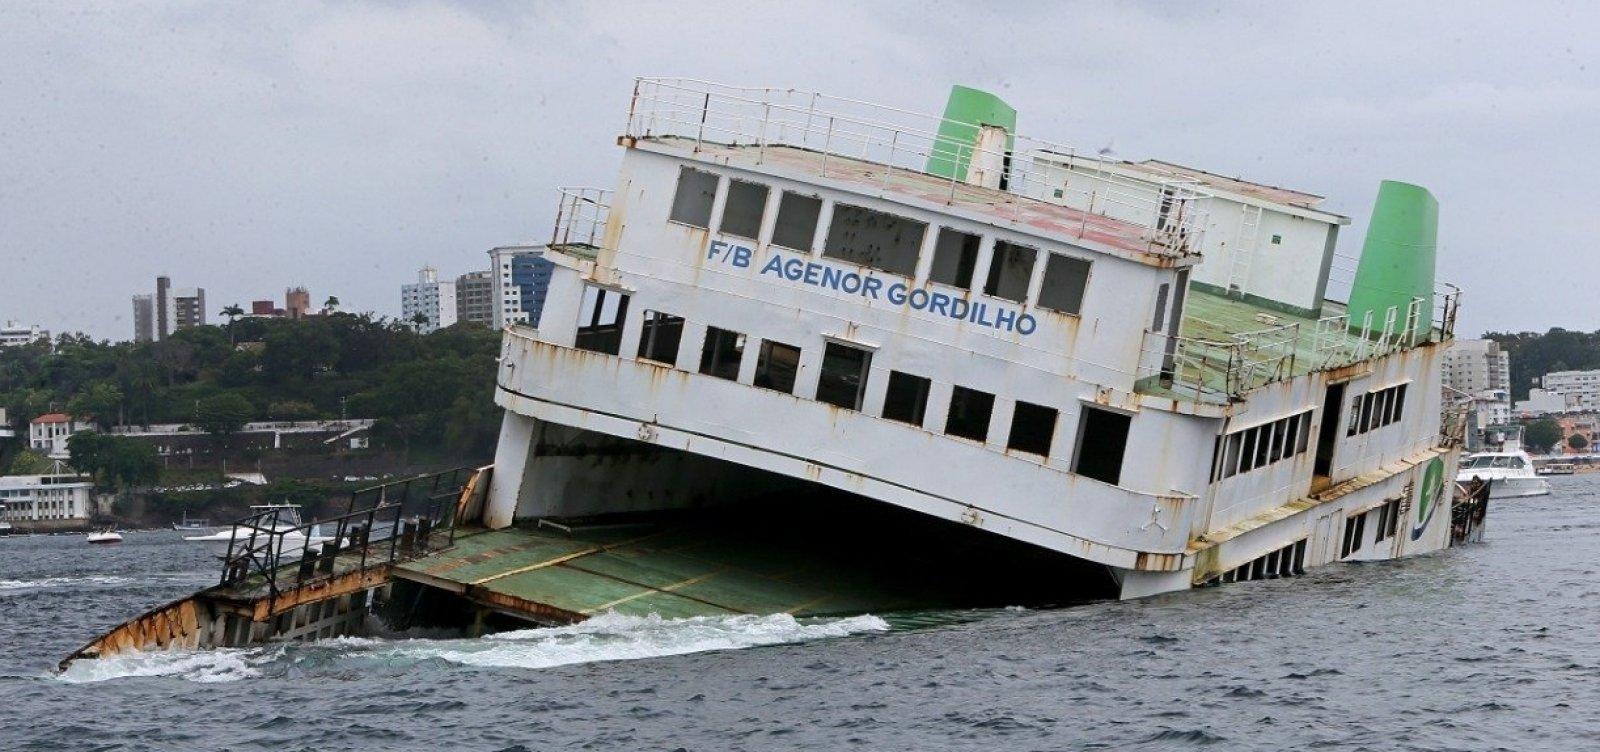 [Ferry-boat Agenor Gordilho é afundado na Baía de Todos-os-Santos]